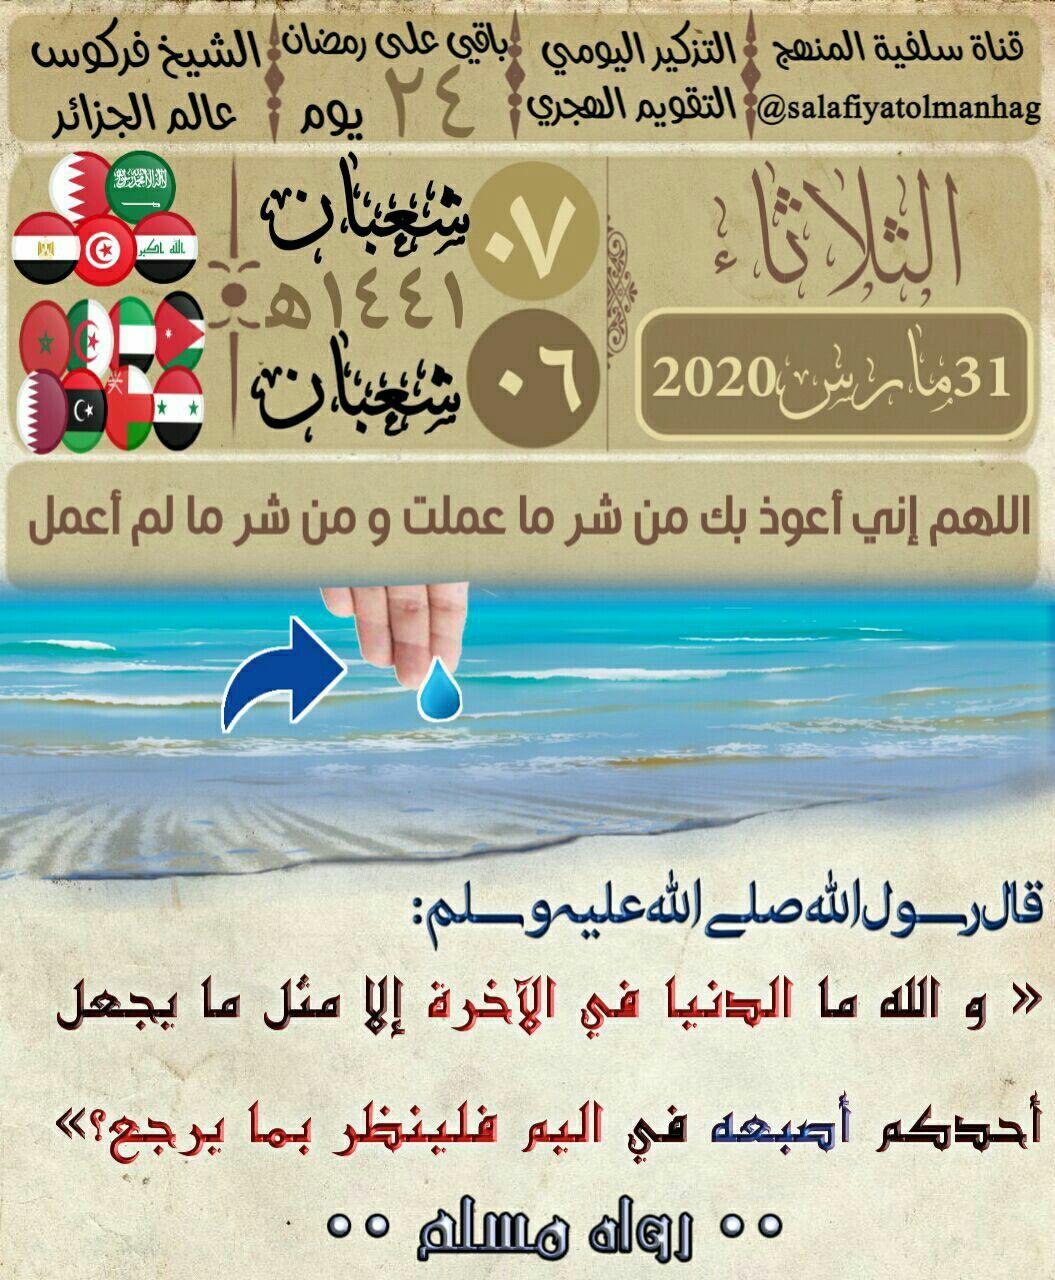 كم يوم باقي على رمضان 2020